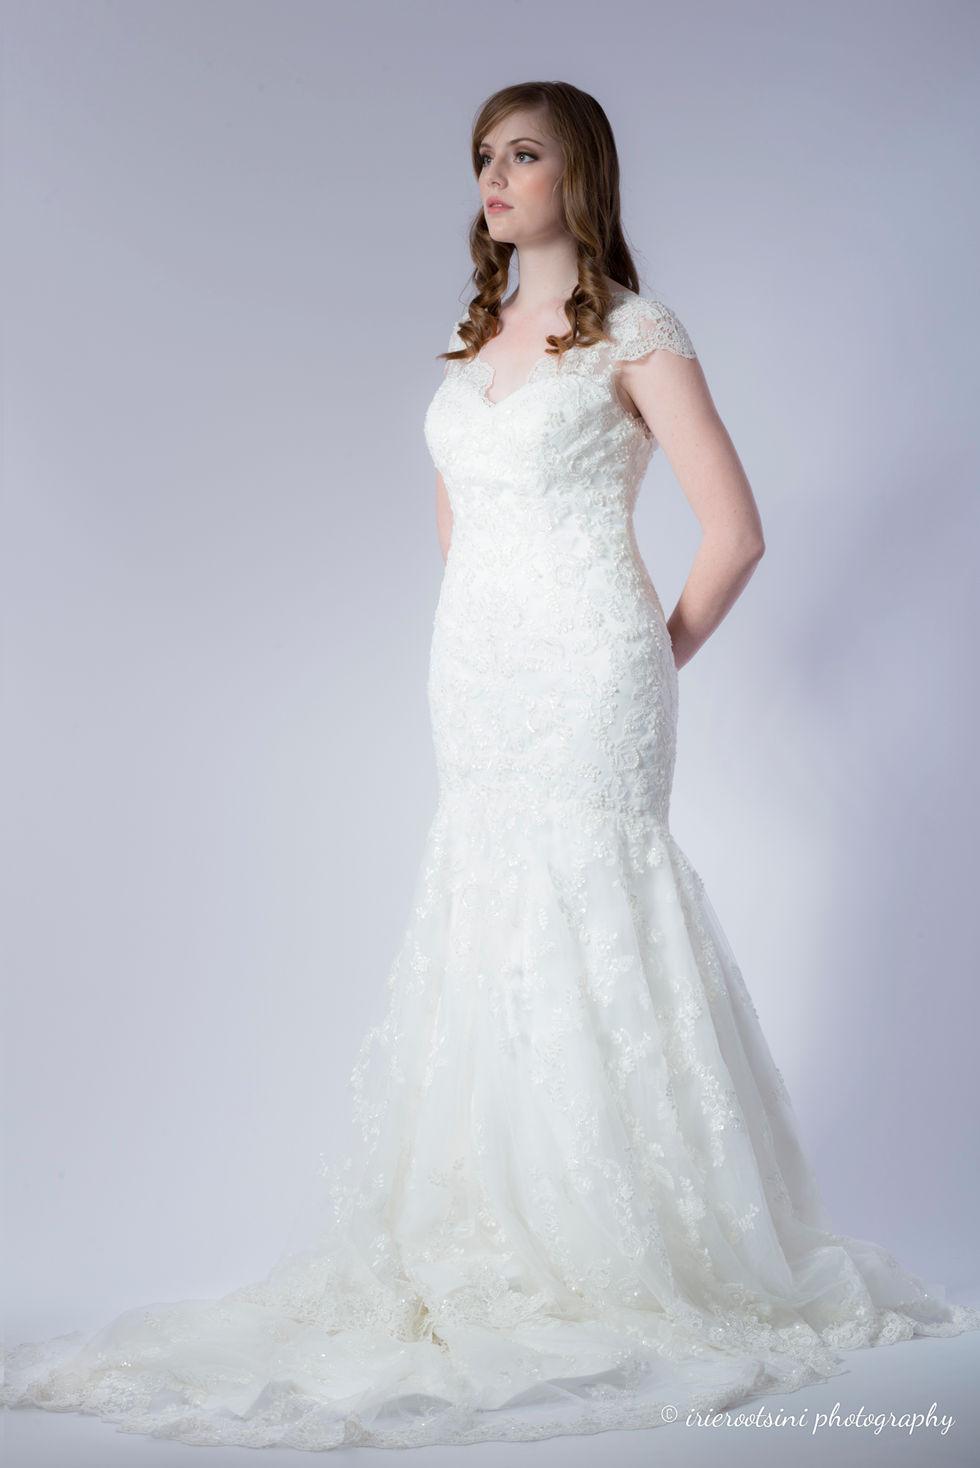 Simply-Brides-Fashion-Photographer-Sydney-6.jpg